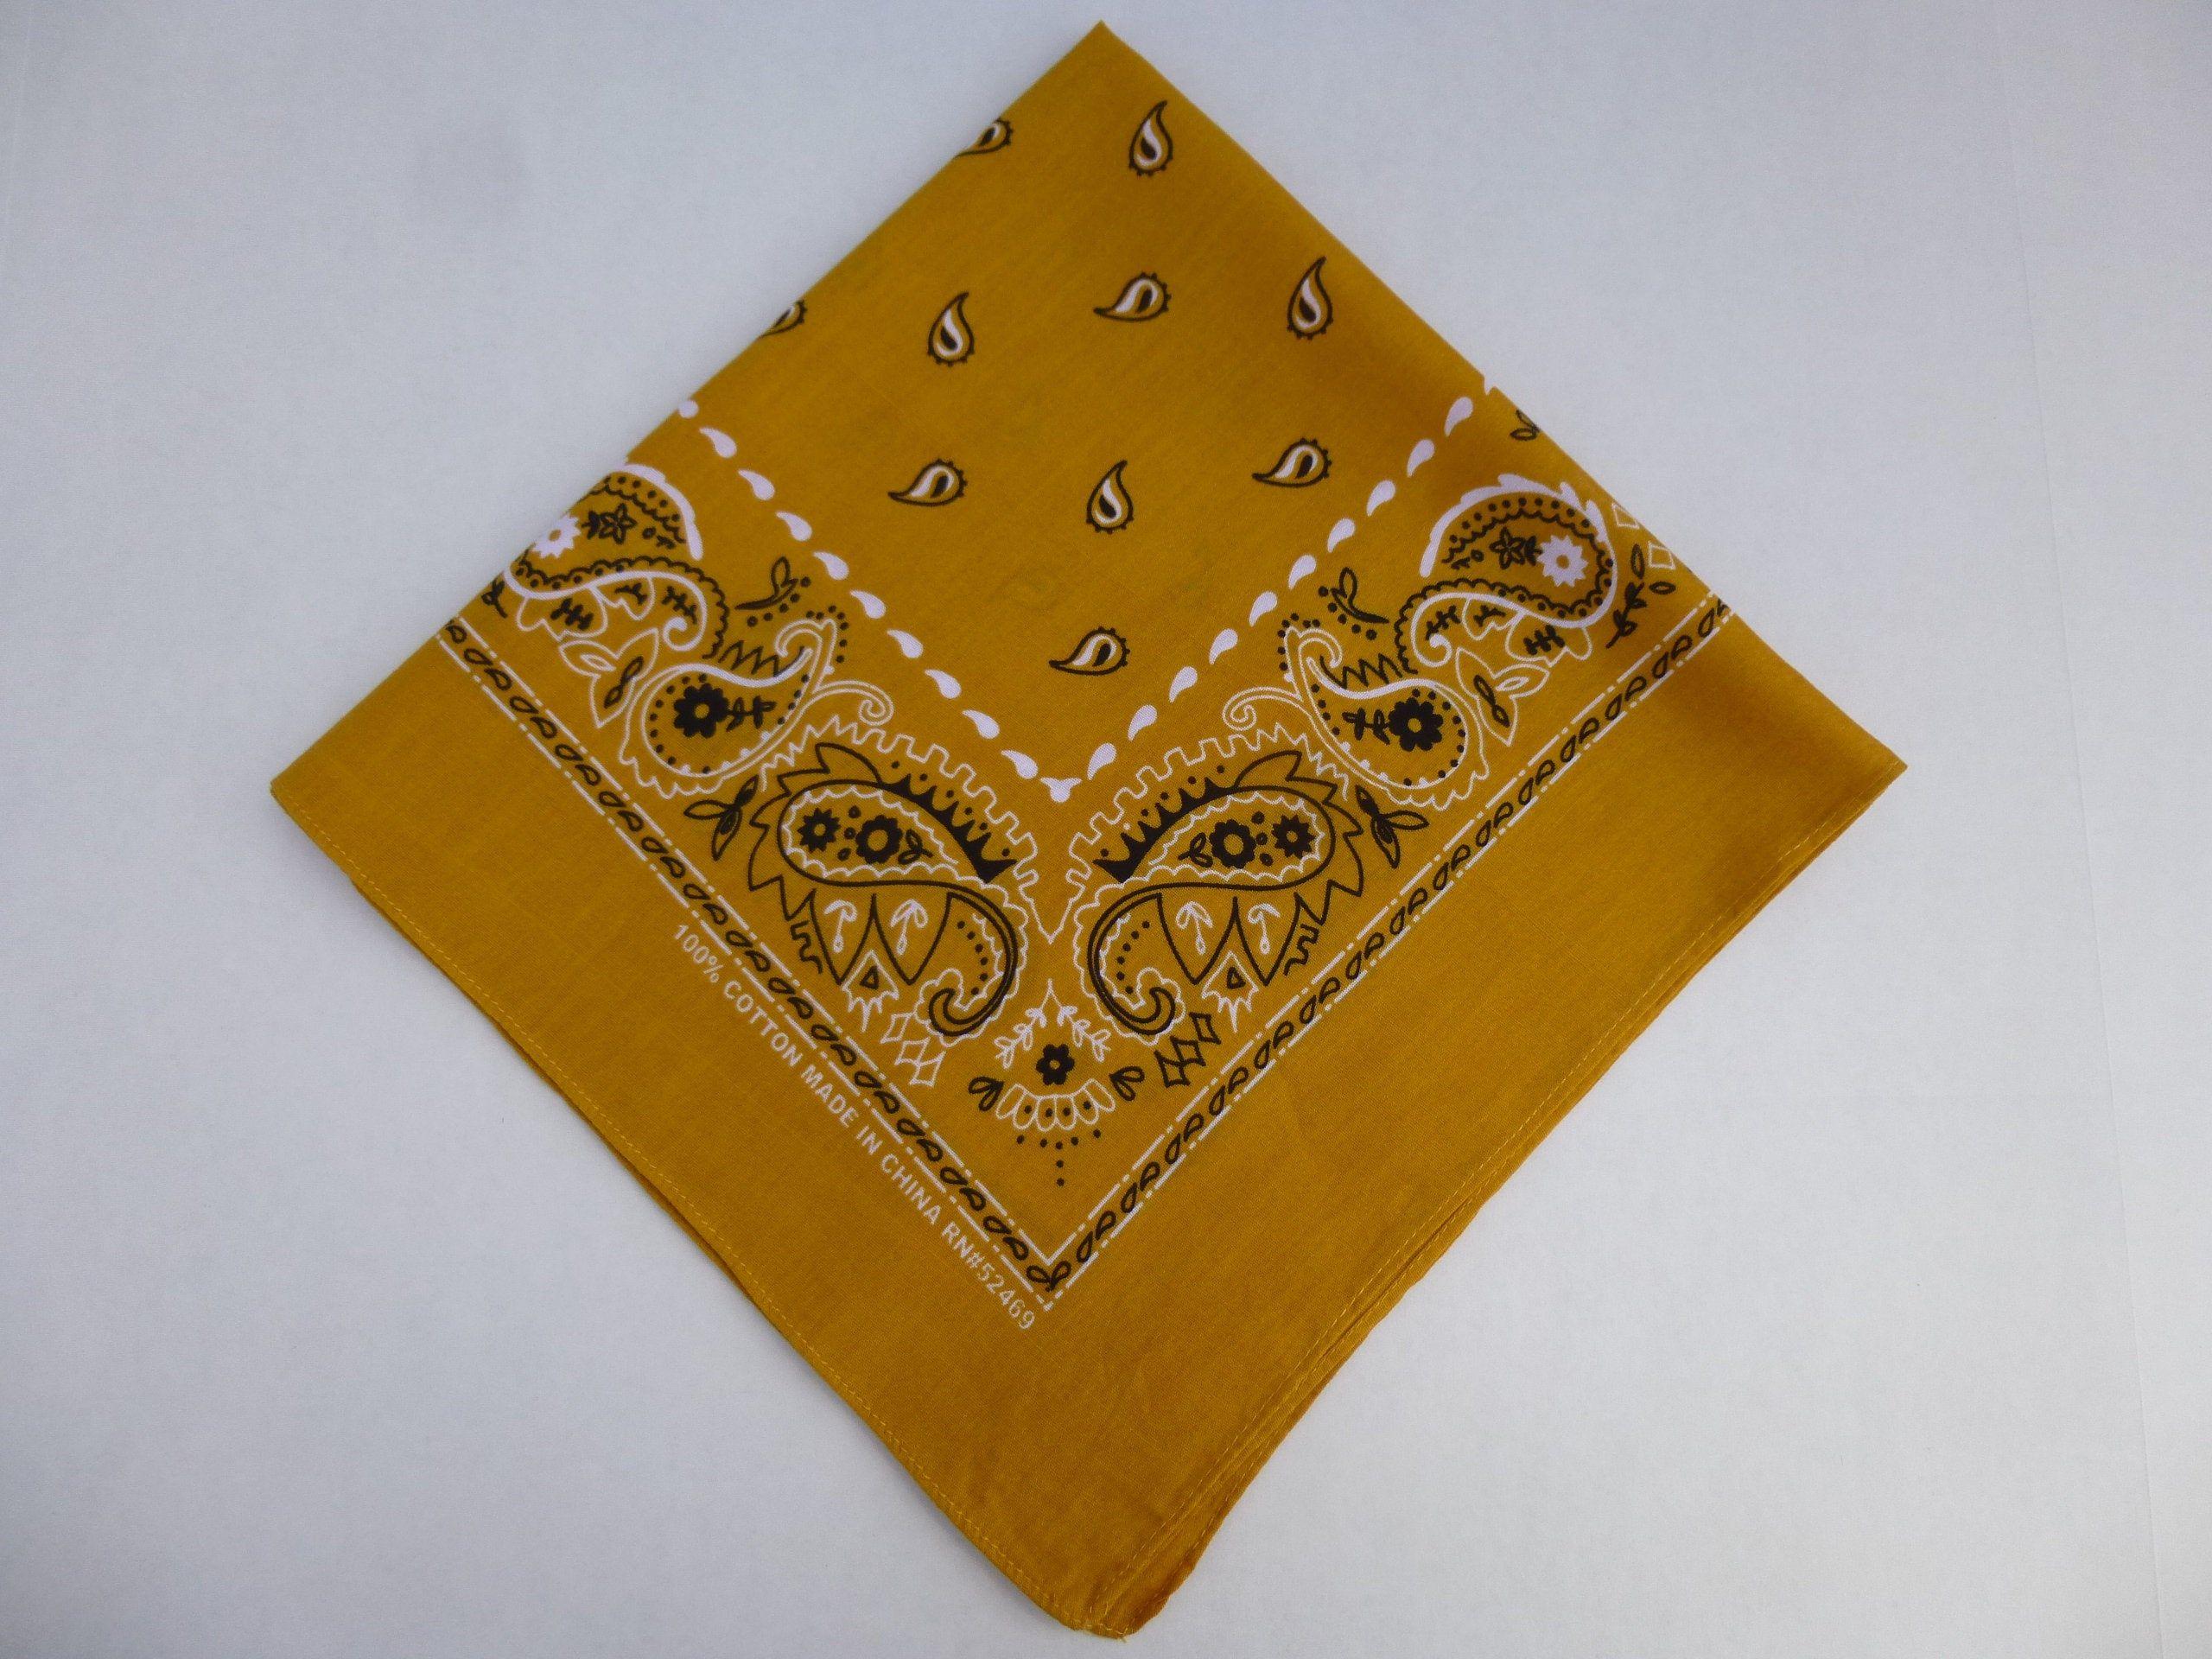 100/% Cotton Square White /& Black Paisley Patterned Bandana Neckerchief Yellow